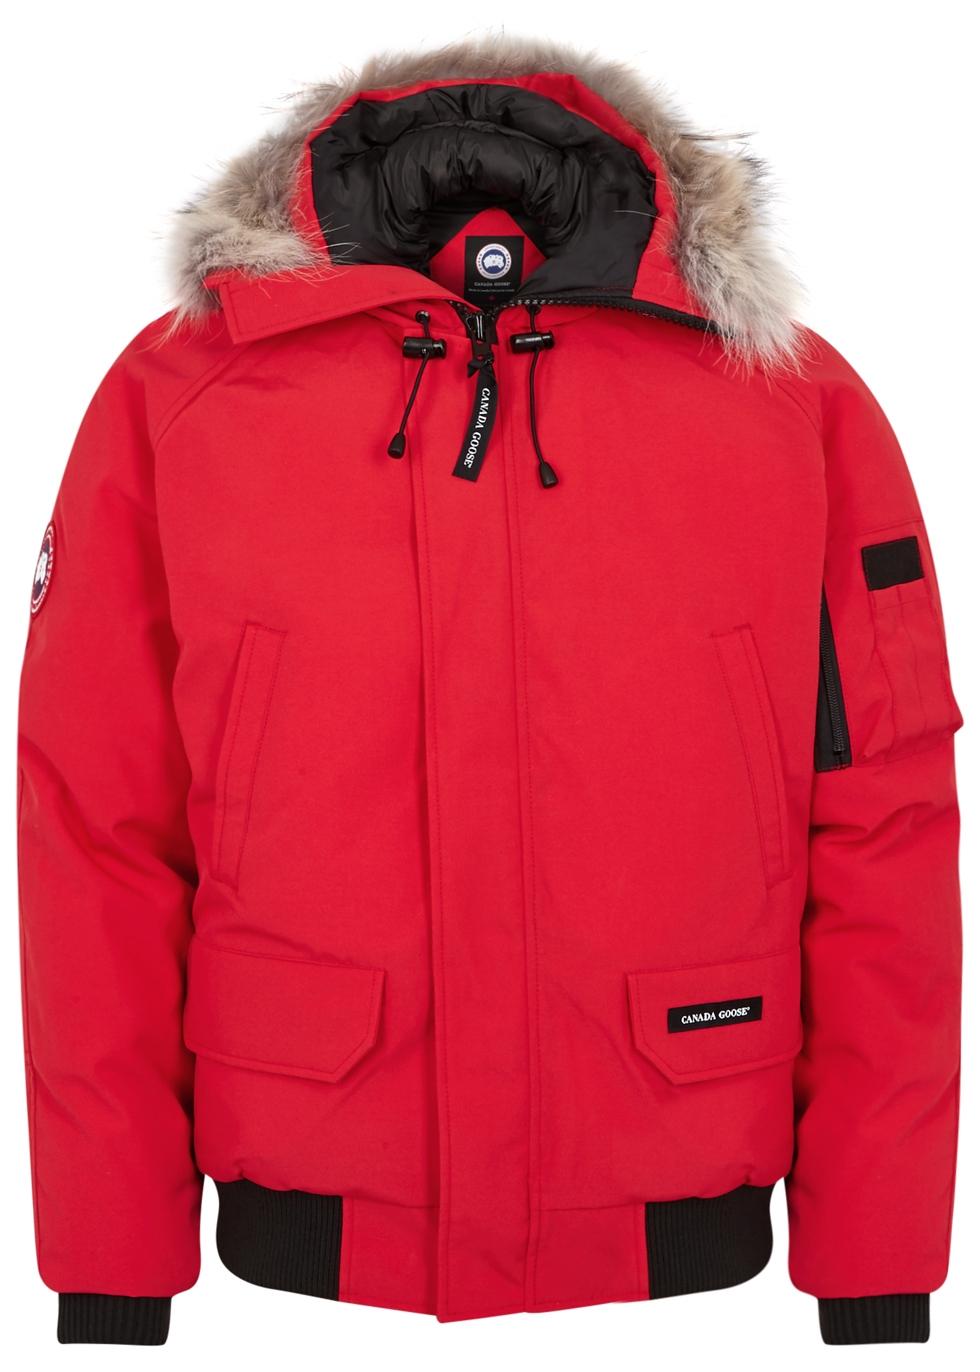 dbea79576241 Men s Designer Jackets - Winter Jackets for Men - Harvey Nichols